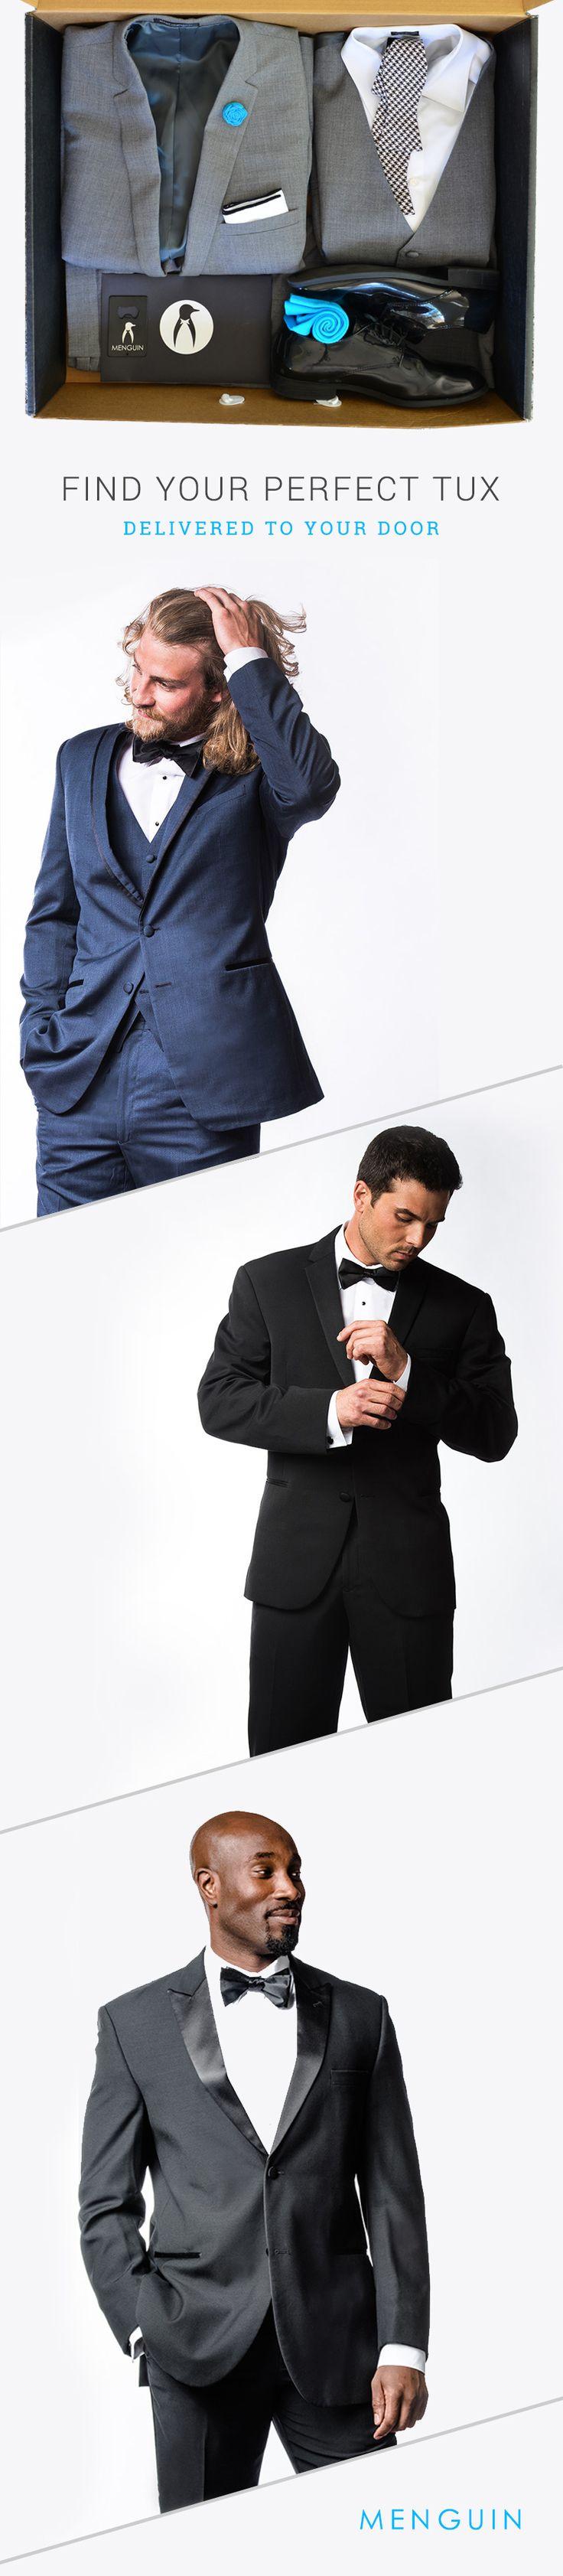 Affordable Tuxedo Rentals Delivered To Your Door | menguin.com